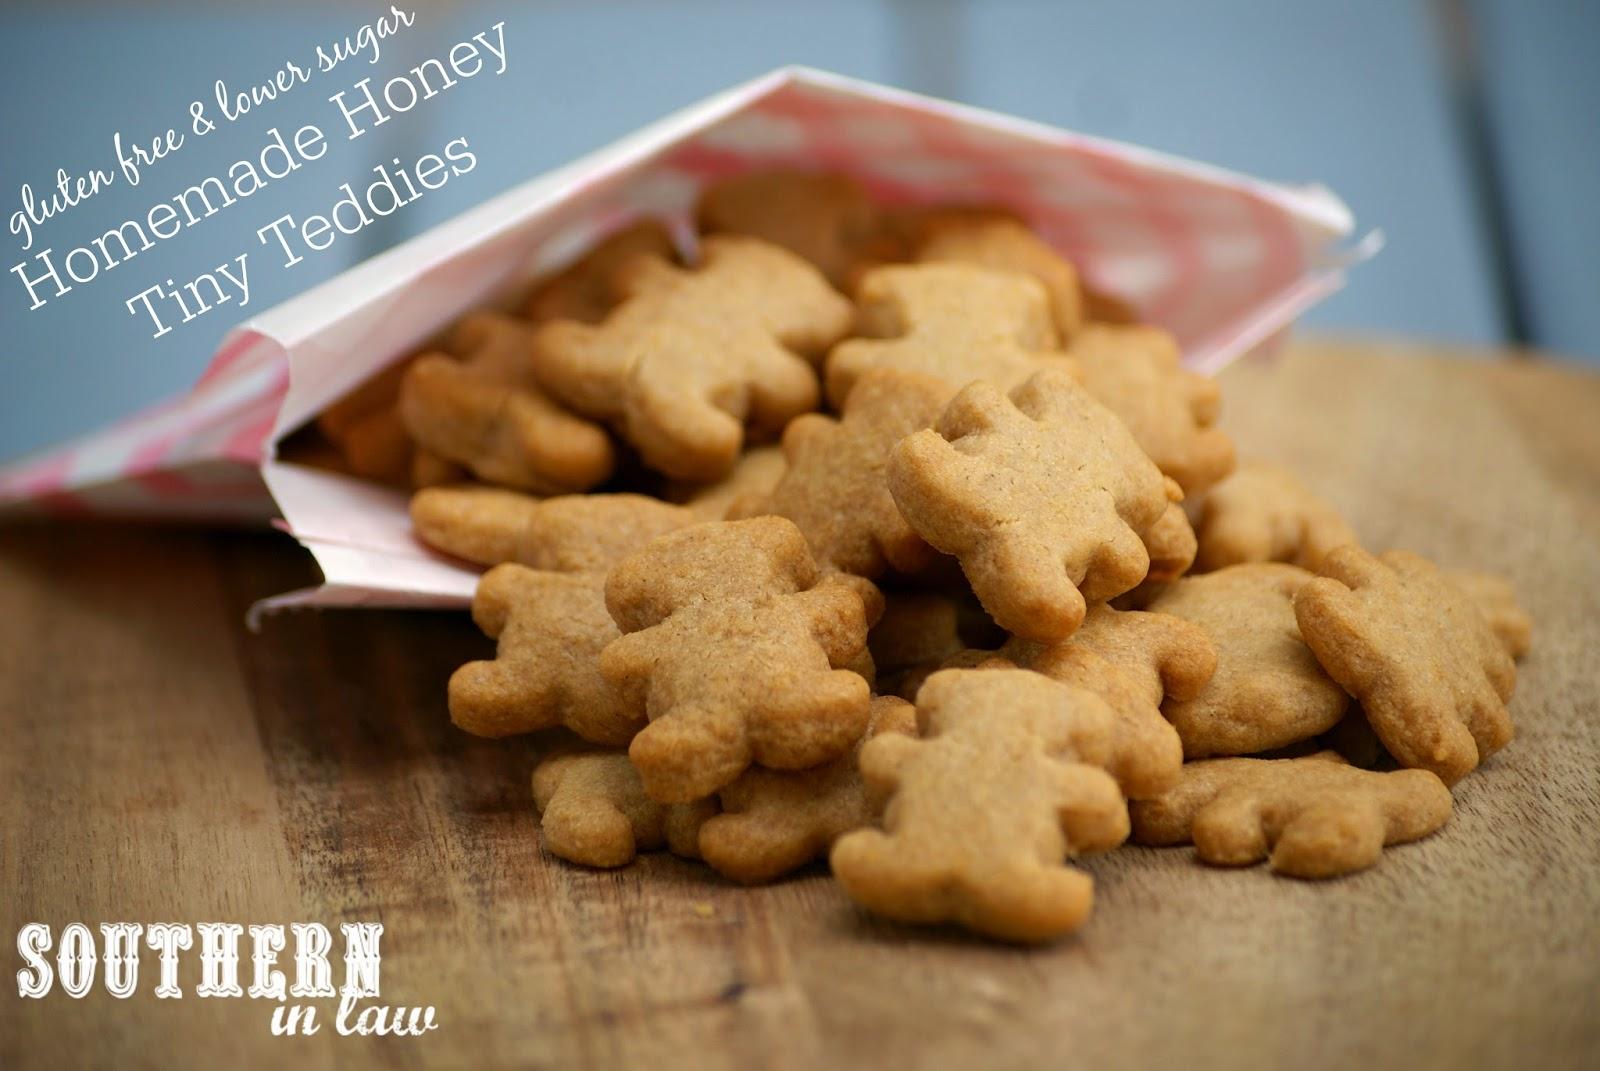 Homemade Gluten Free Honey Tiny Teddies Recipe - gluten free, nut free, egg free, healthy, low sugar